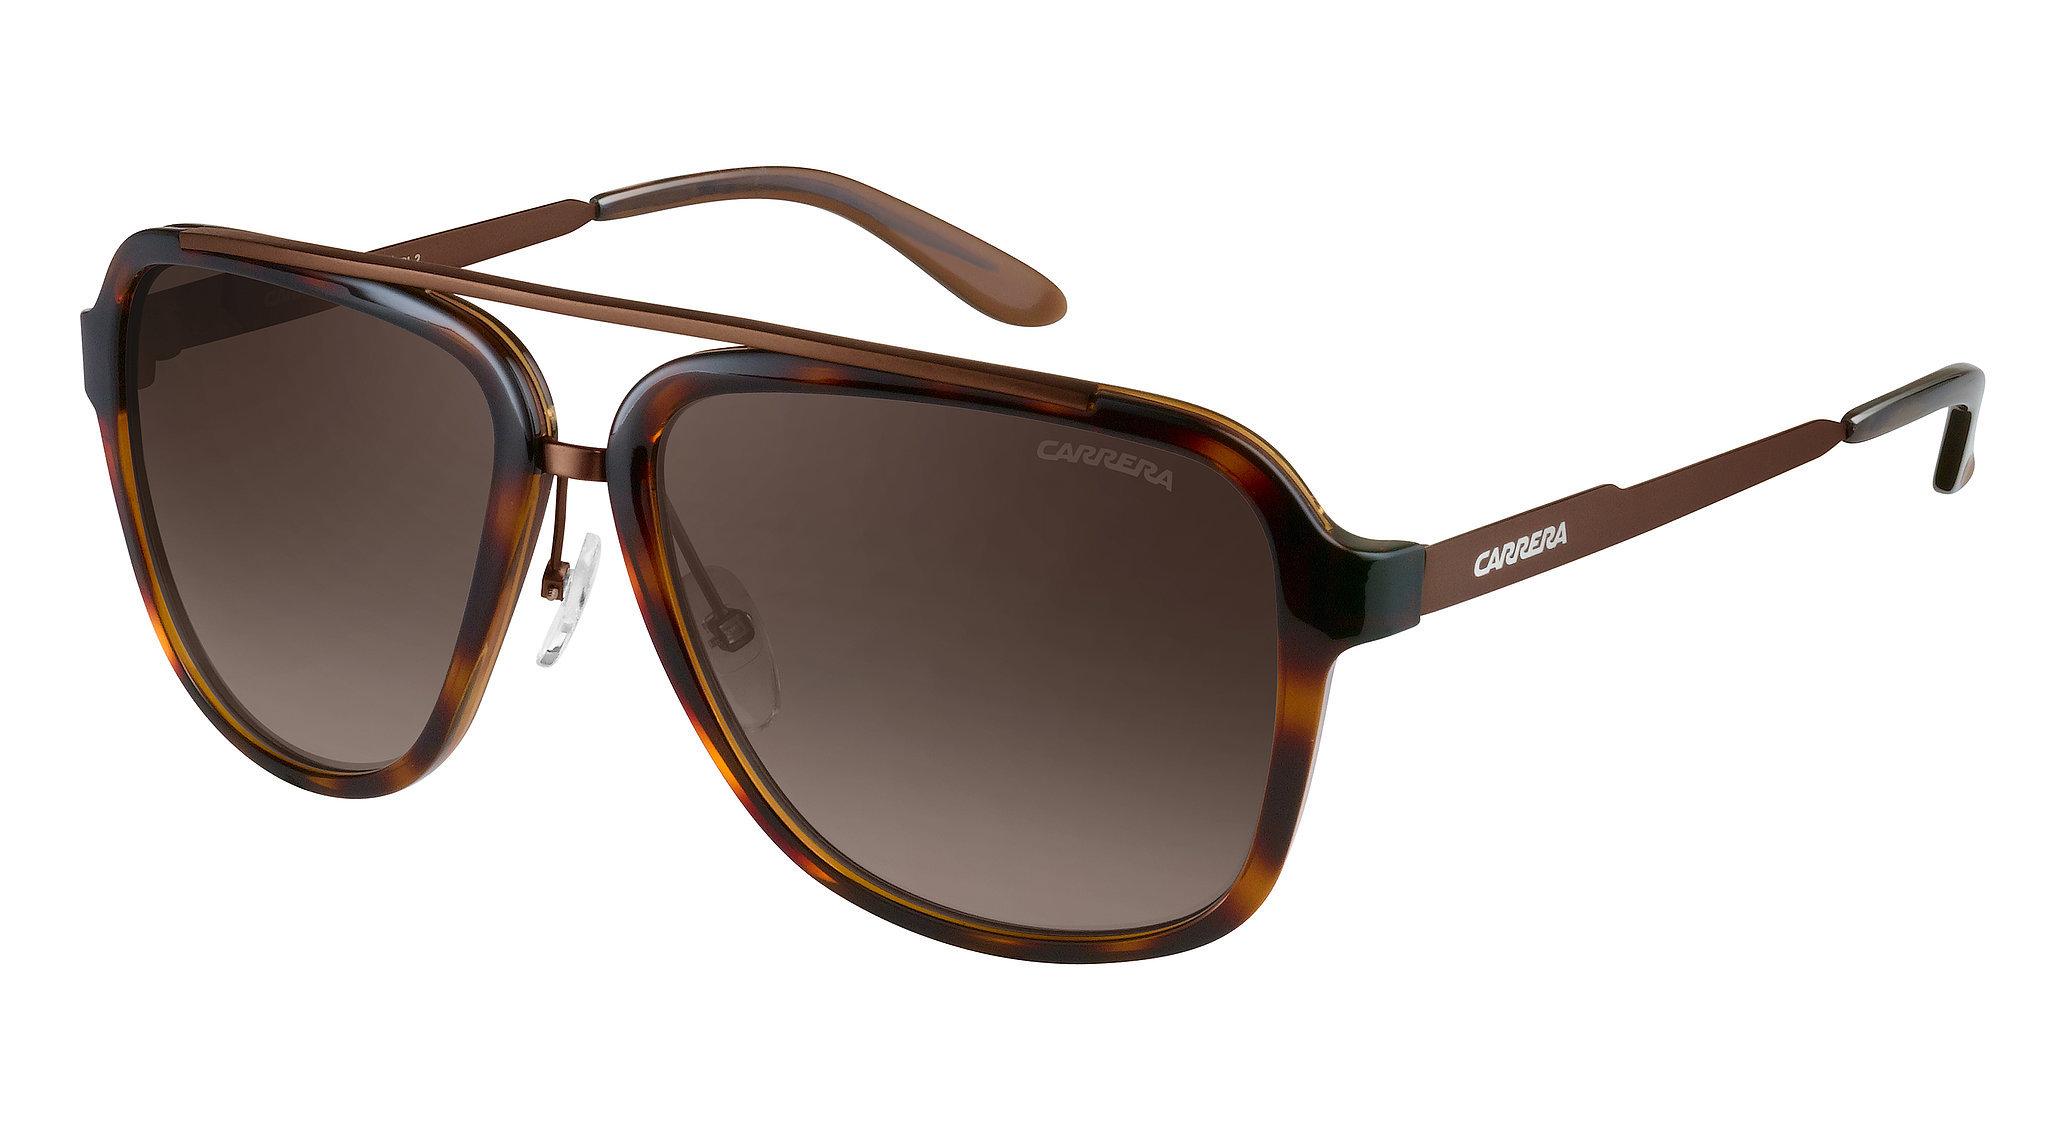 Carrera Sunglasses 2013